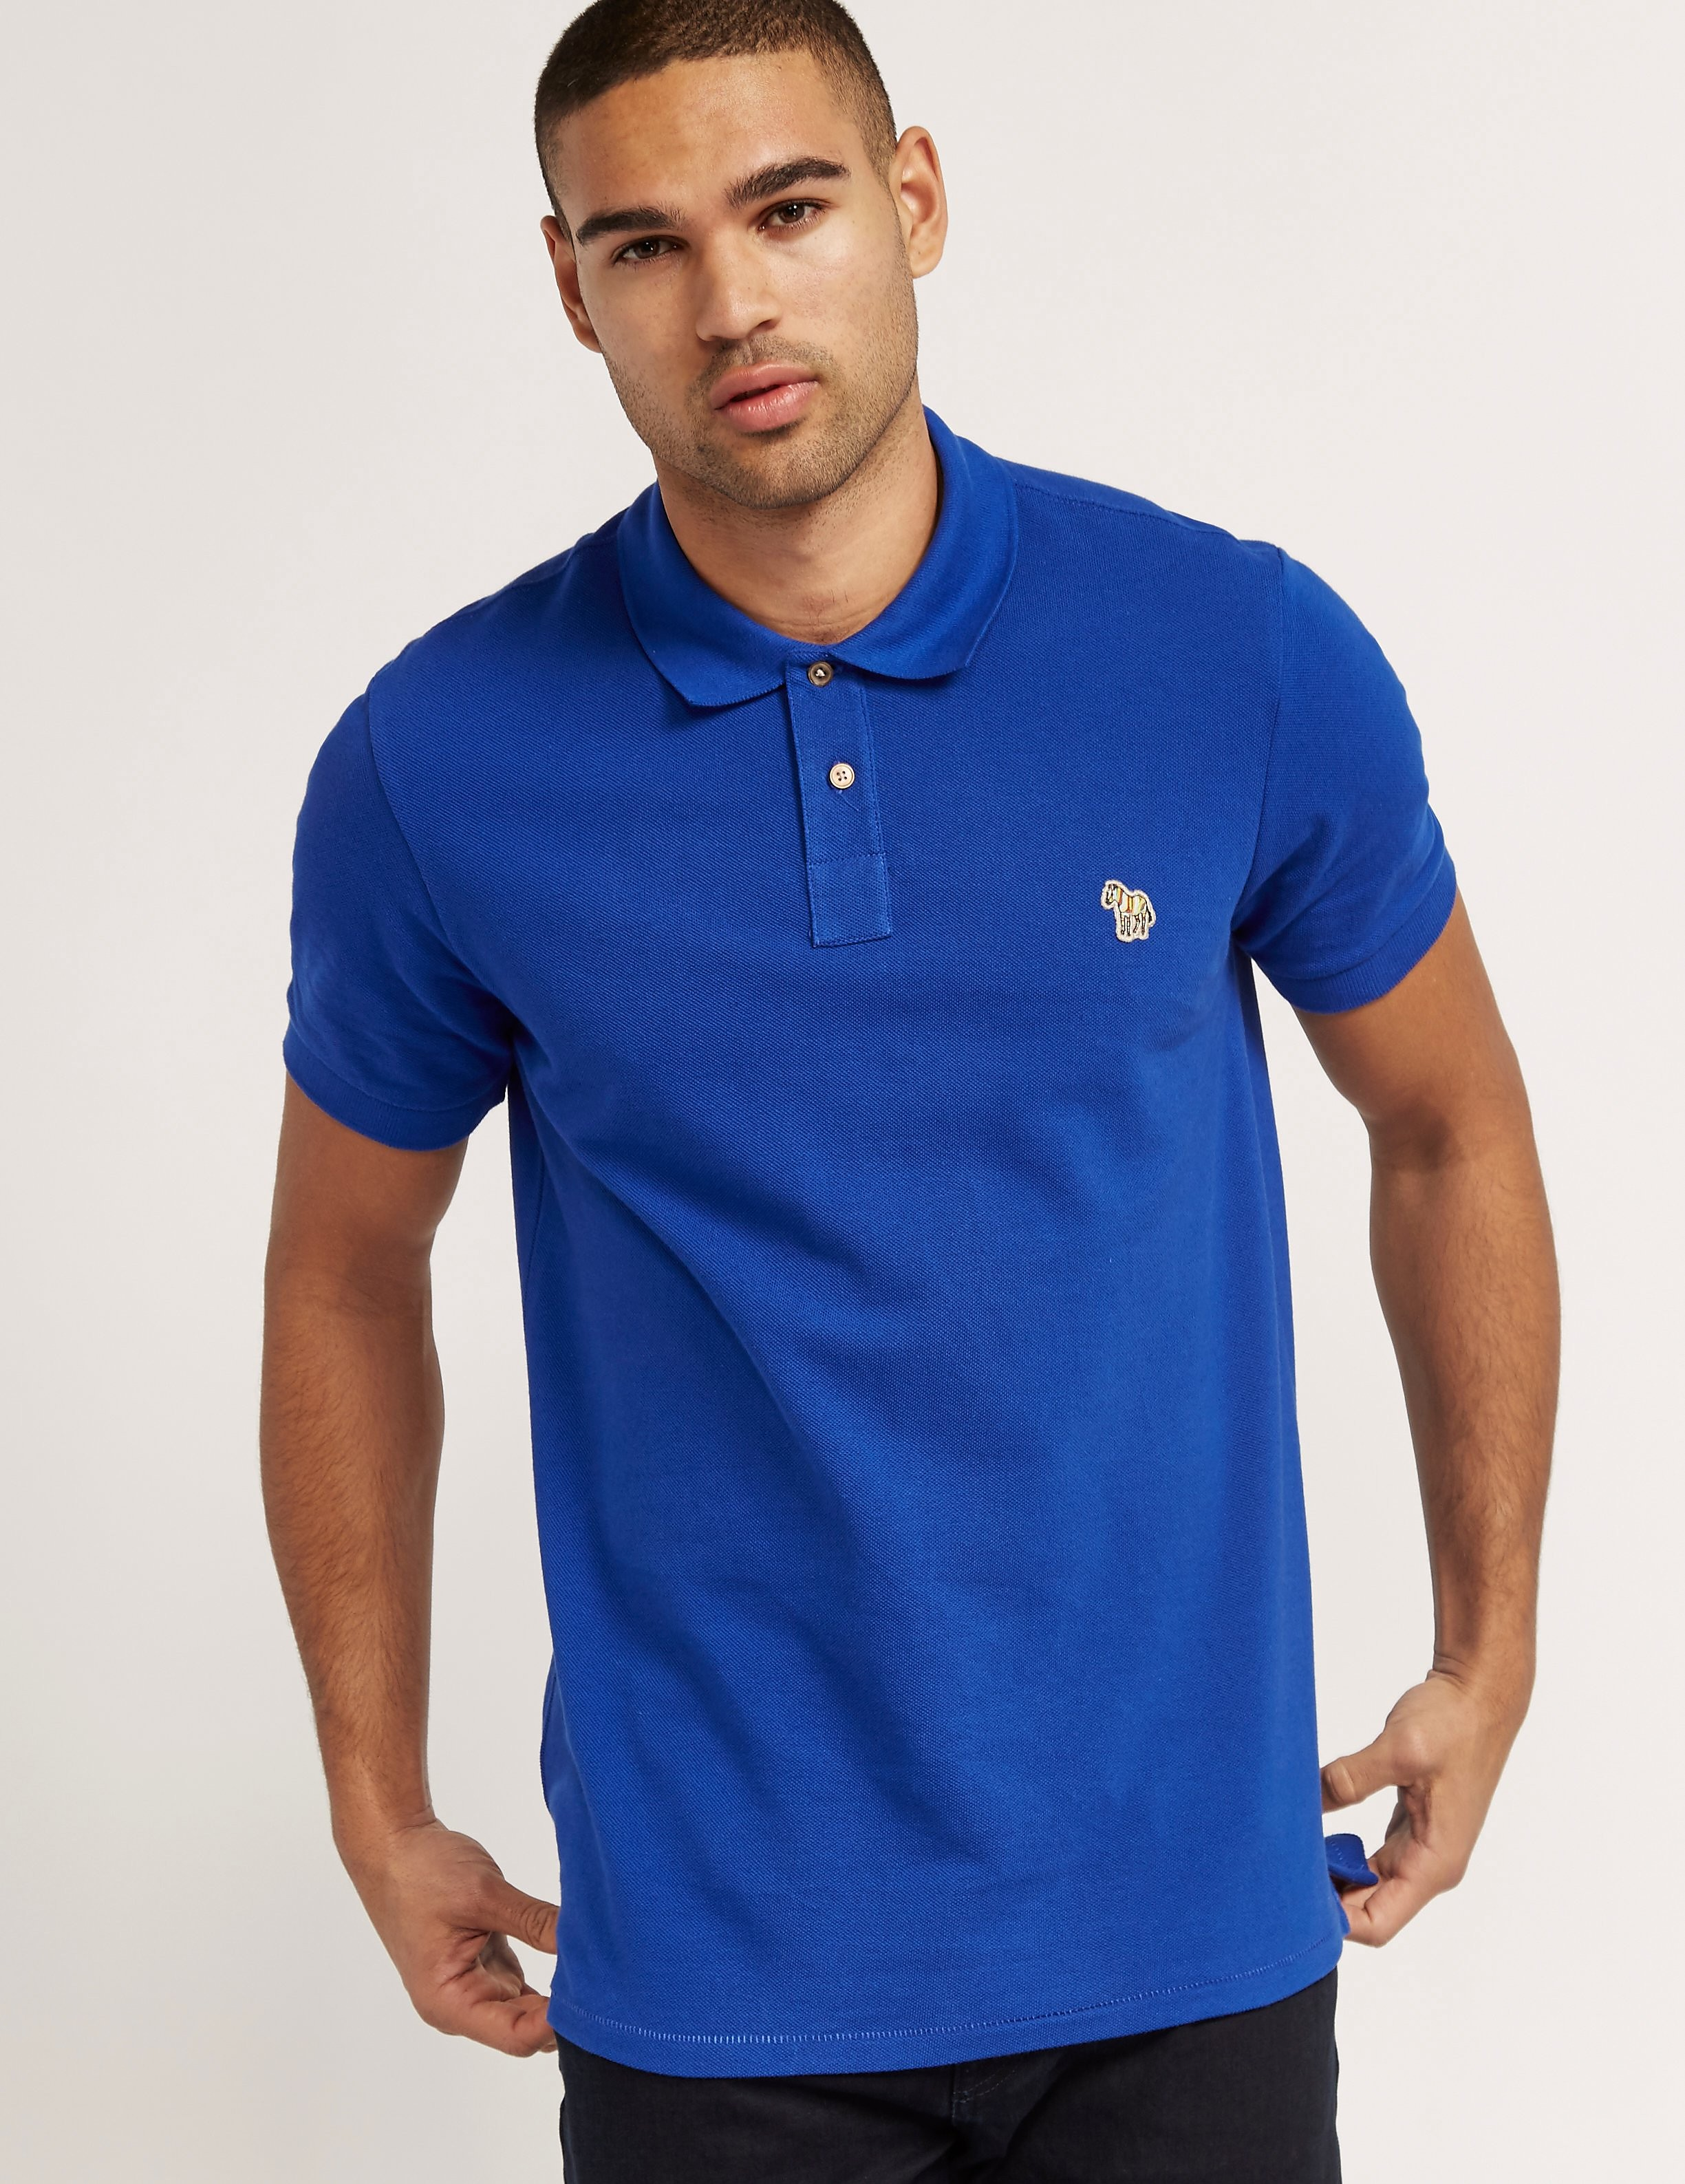 Paul Smith Zebra Polo Shirt